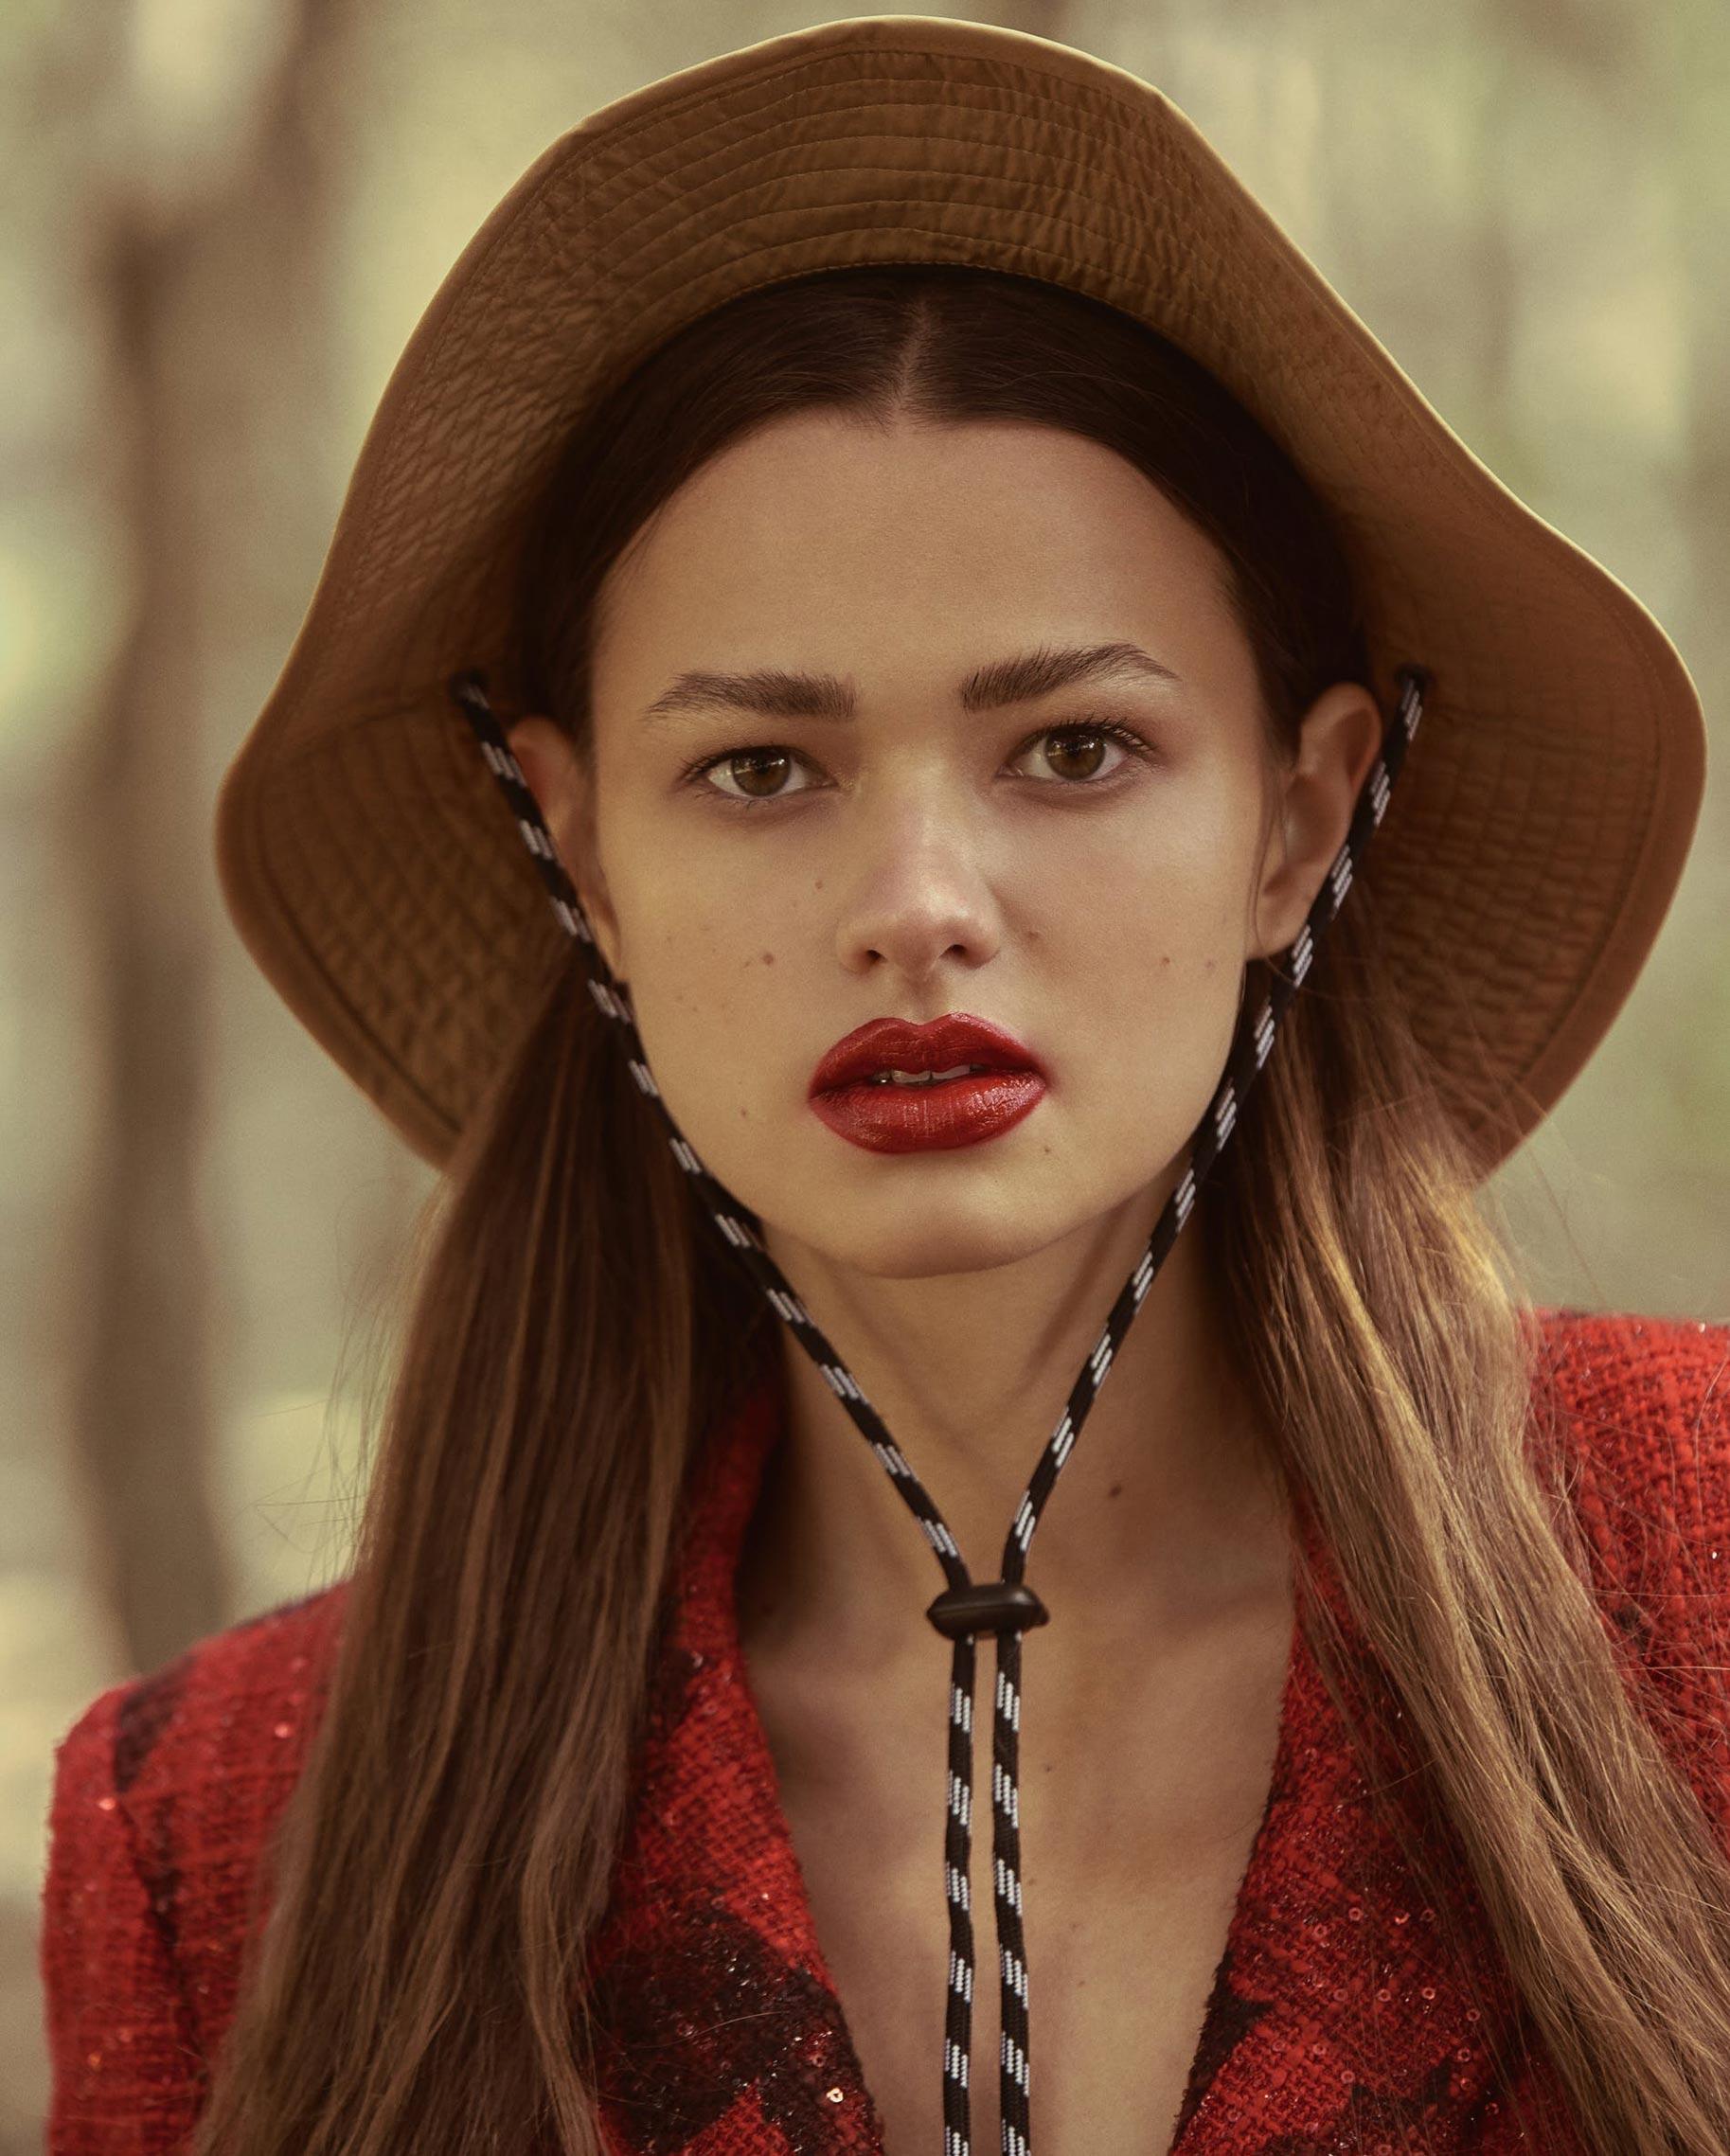 Диана Свиридова в лесу демонстрирует винтажную технику и новинки моды / фото 10